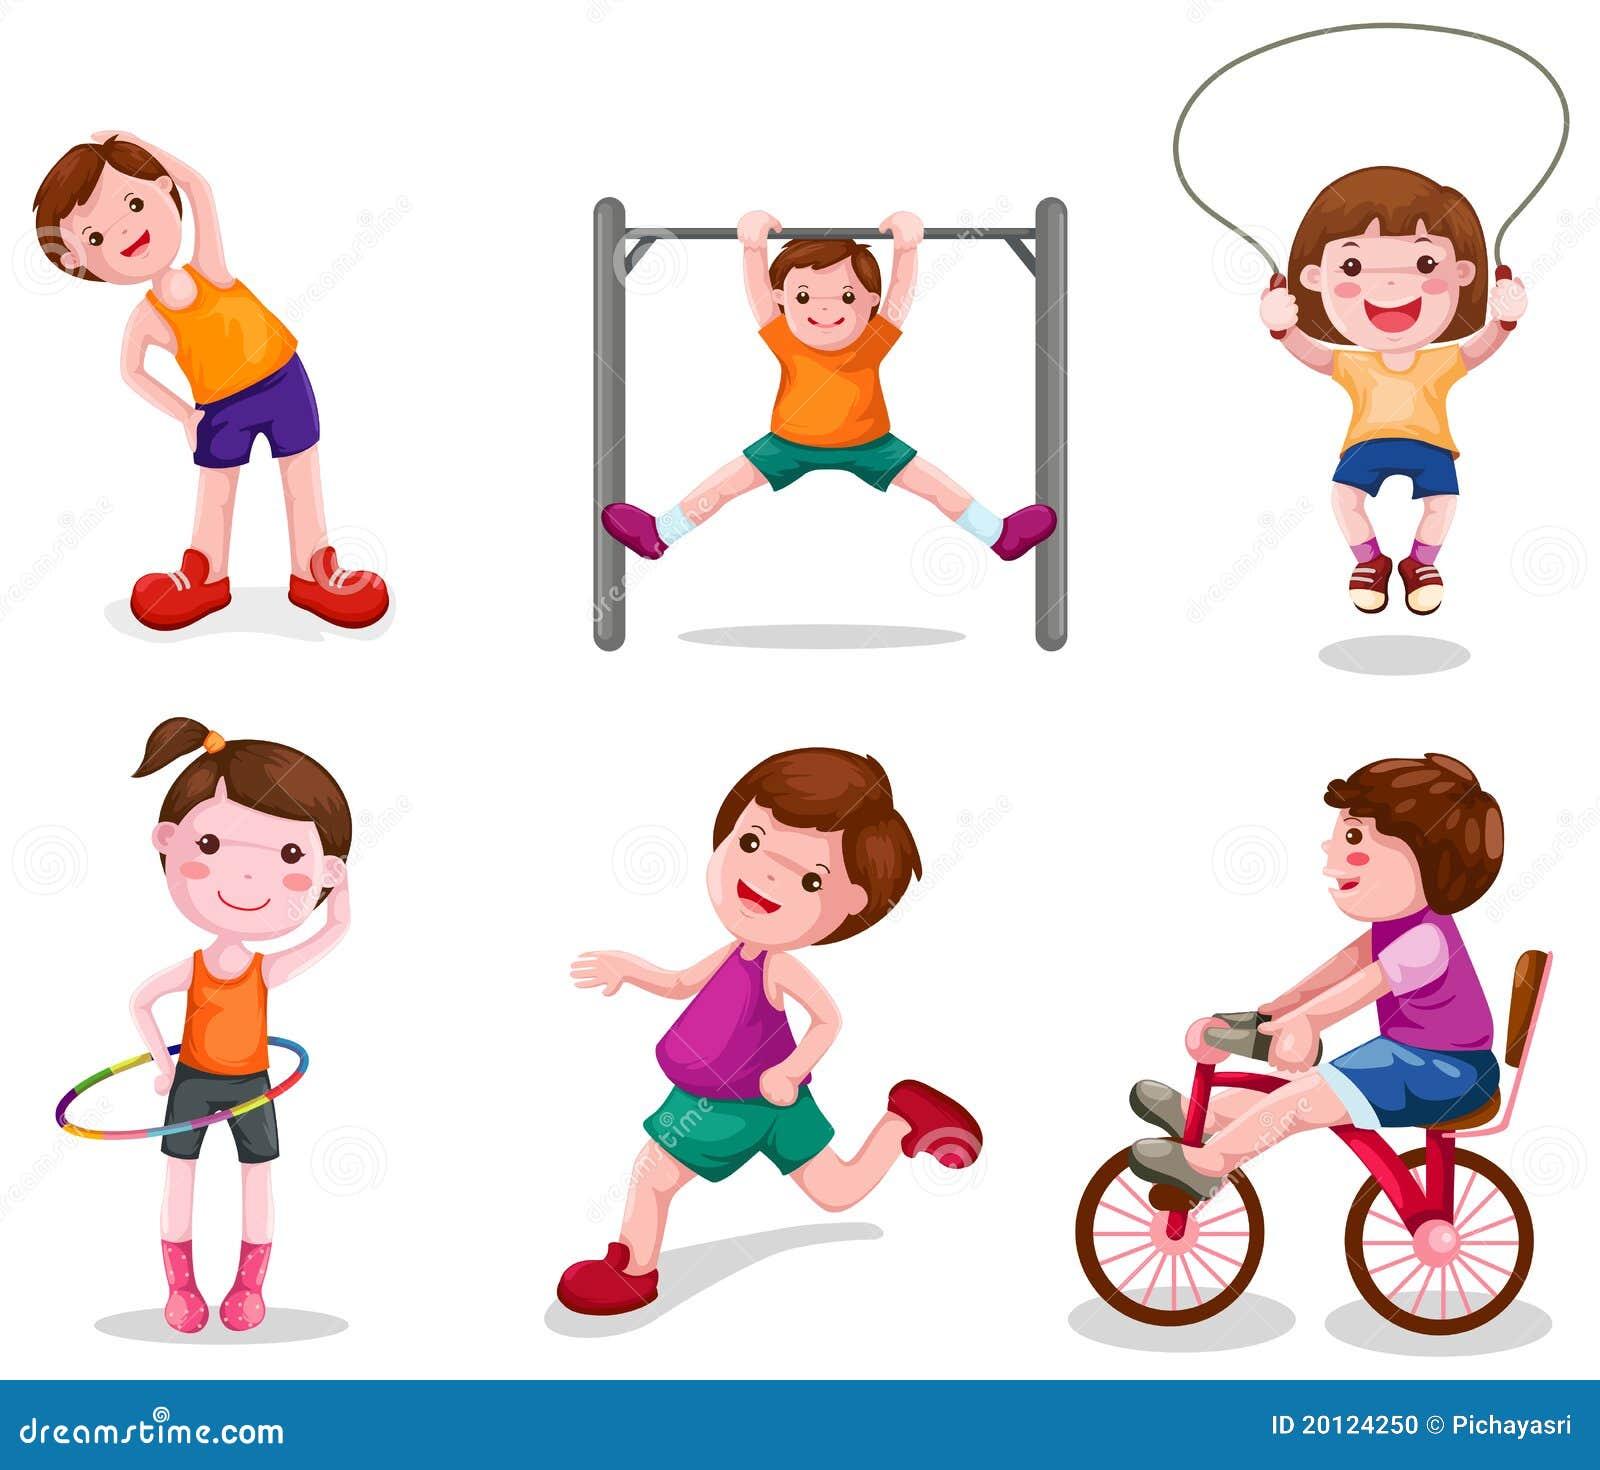 Kids Activity